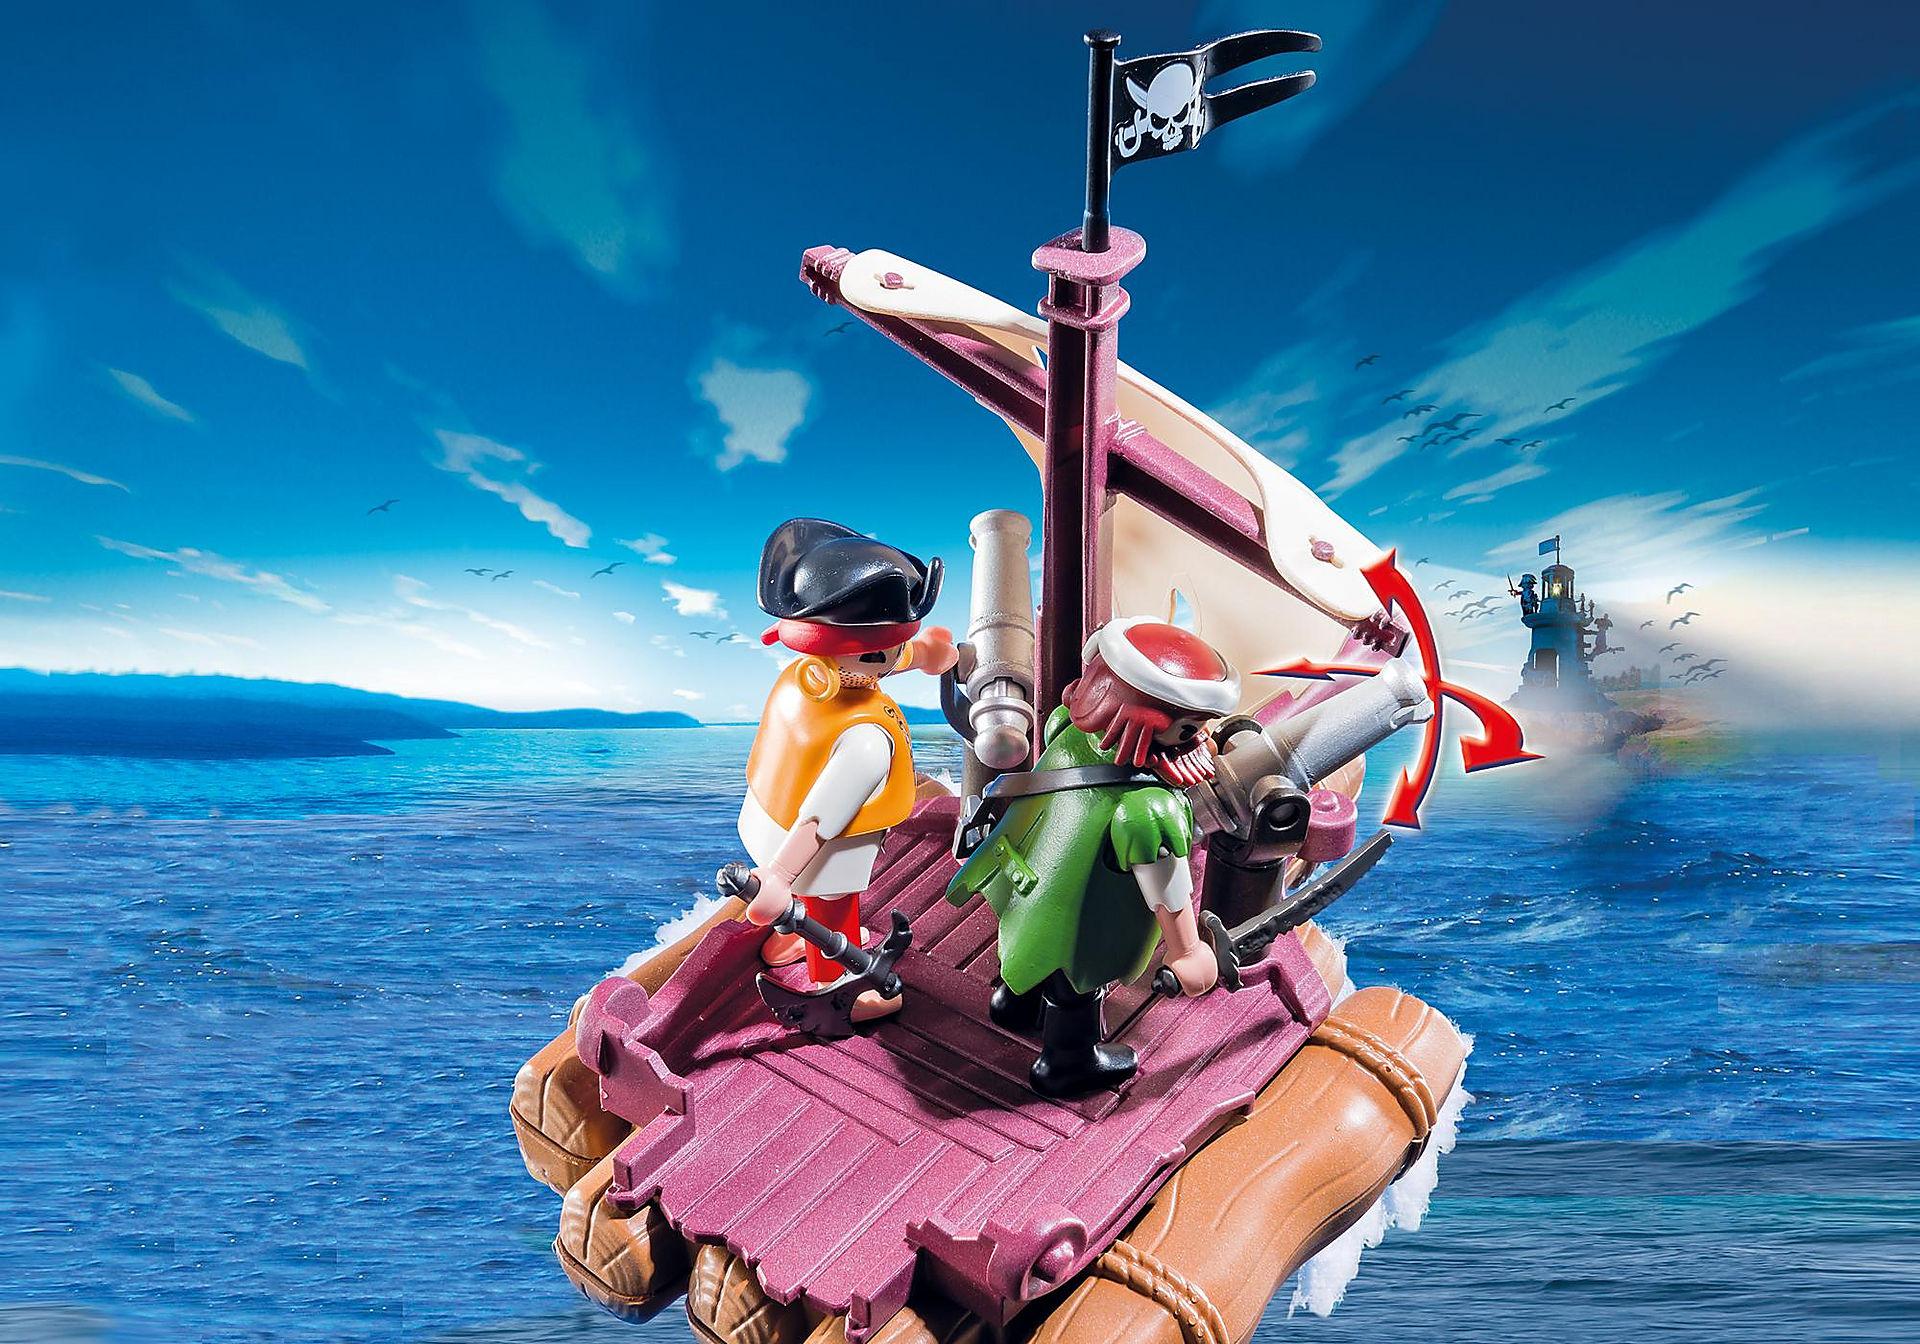 http://media.playmobil.com/i/playmobil/6682_product_extra1/Pirate Raft